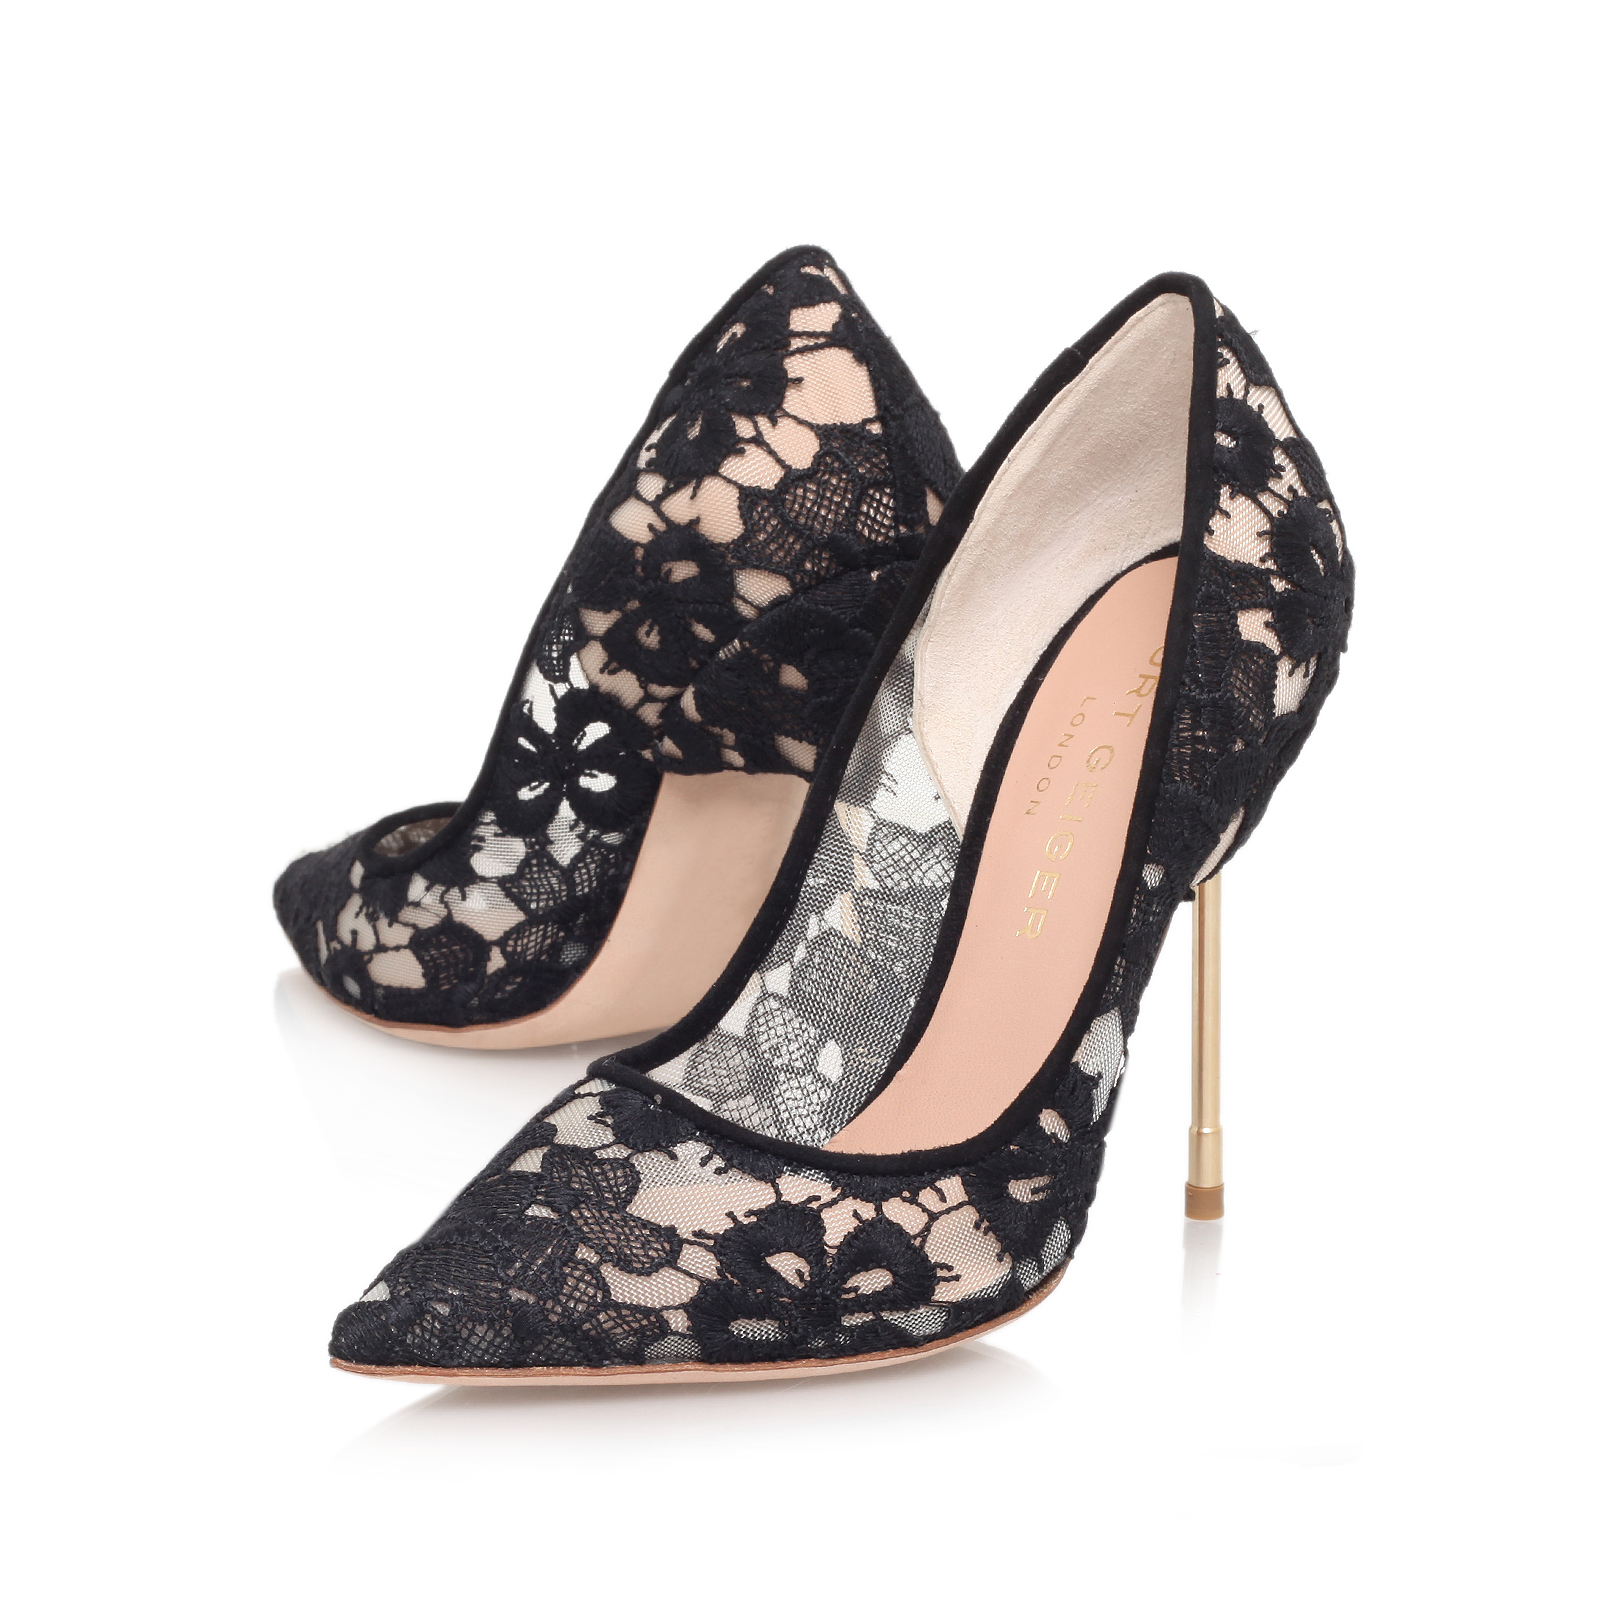 Kurt Geiger Britton - black high heel court shoes Quality Free Shipping Free Shipping Inexpensive 3MiuKiP